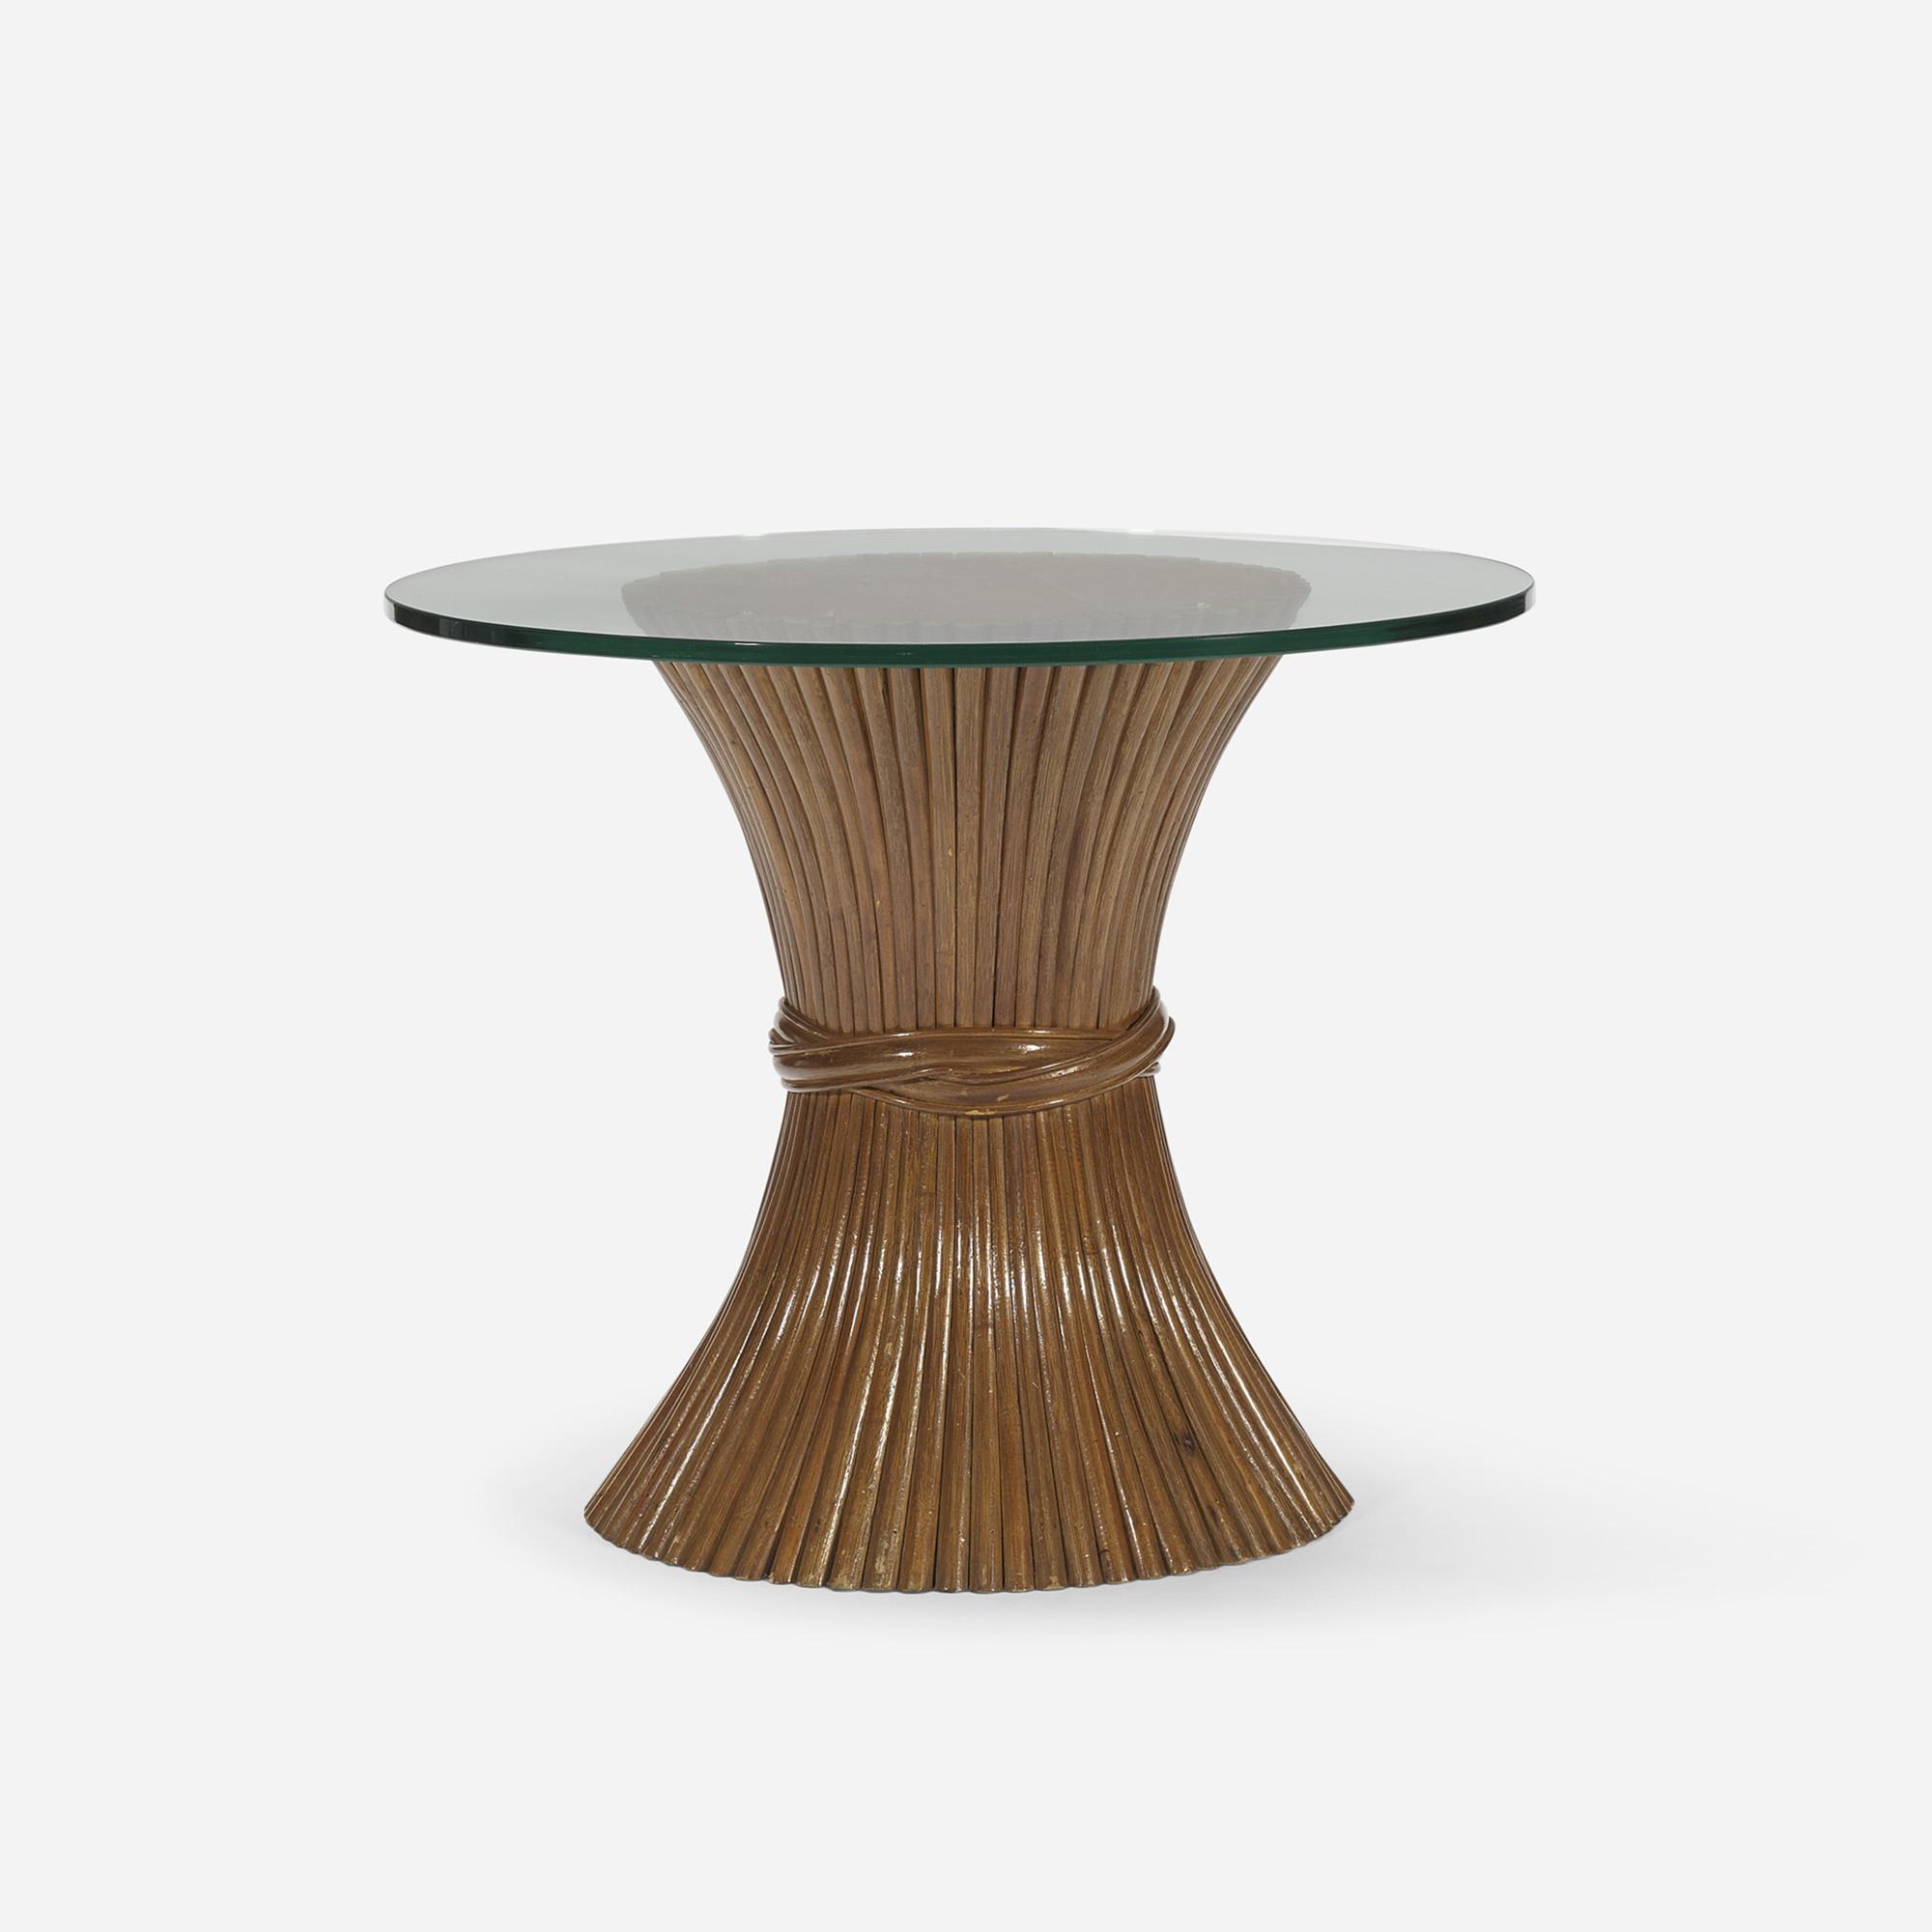 561: John and Elinor McGuire / Trompe l'Oeil table (1 of 3)